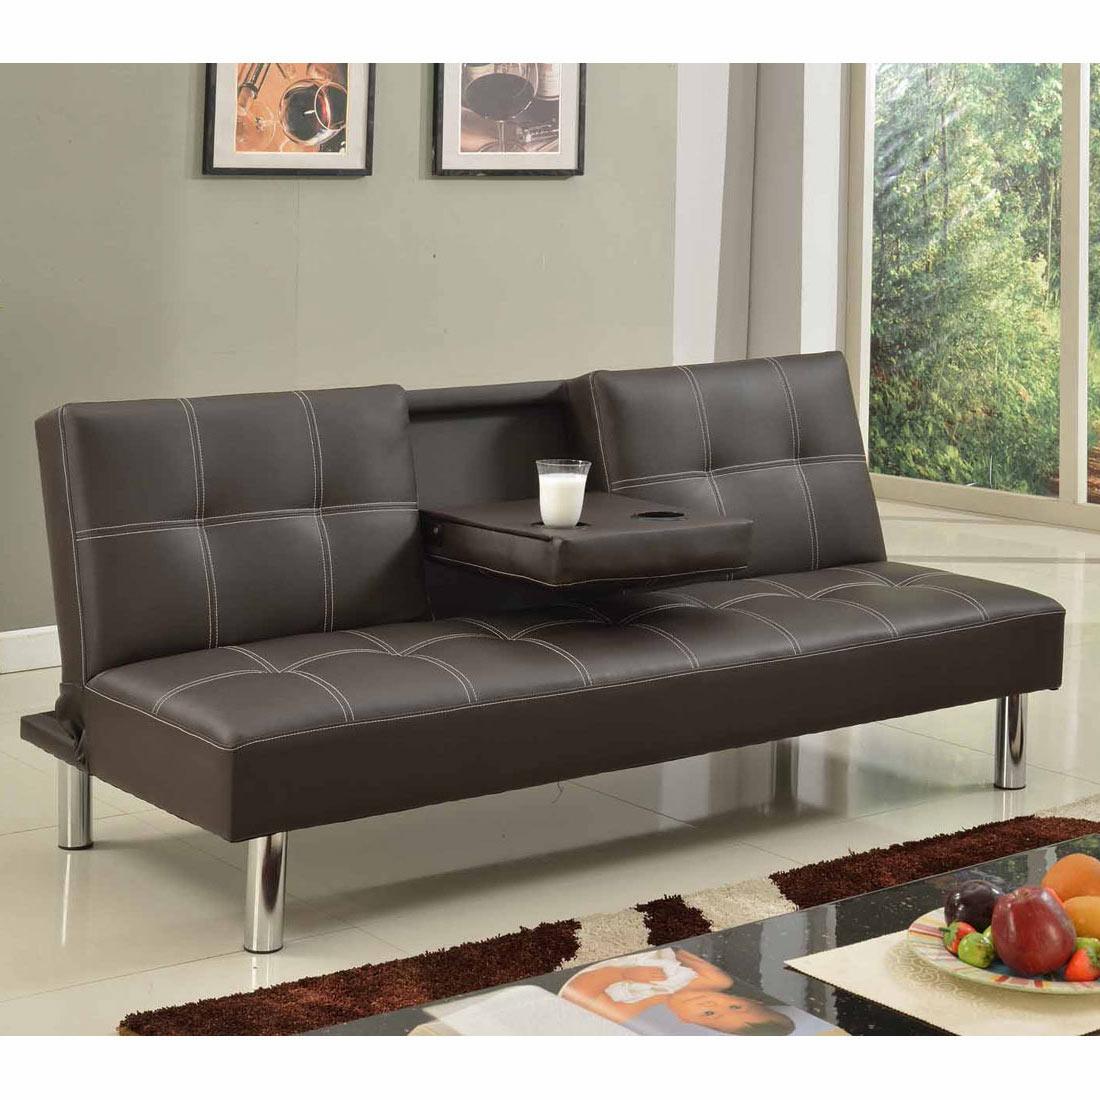 Cinemo 3 Seater Sofa Bed Faux Leather W Fold Down Table Chrome Legs Futon Ebay